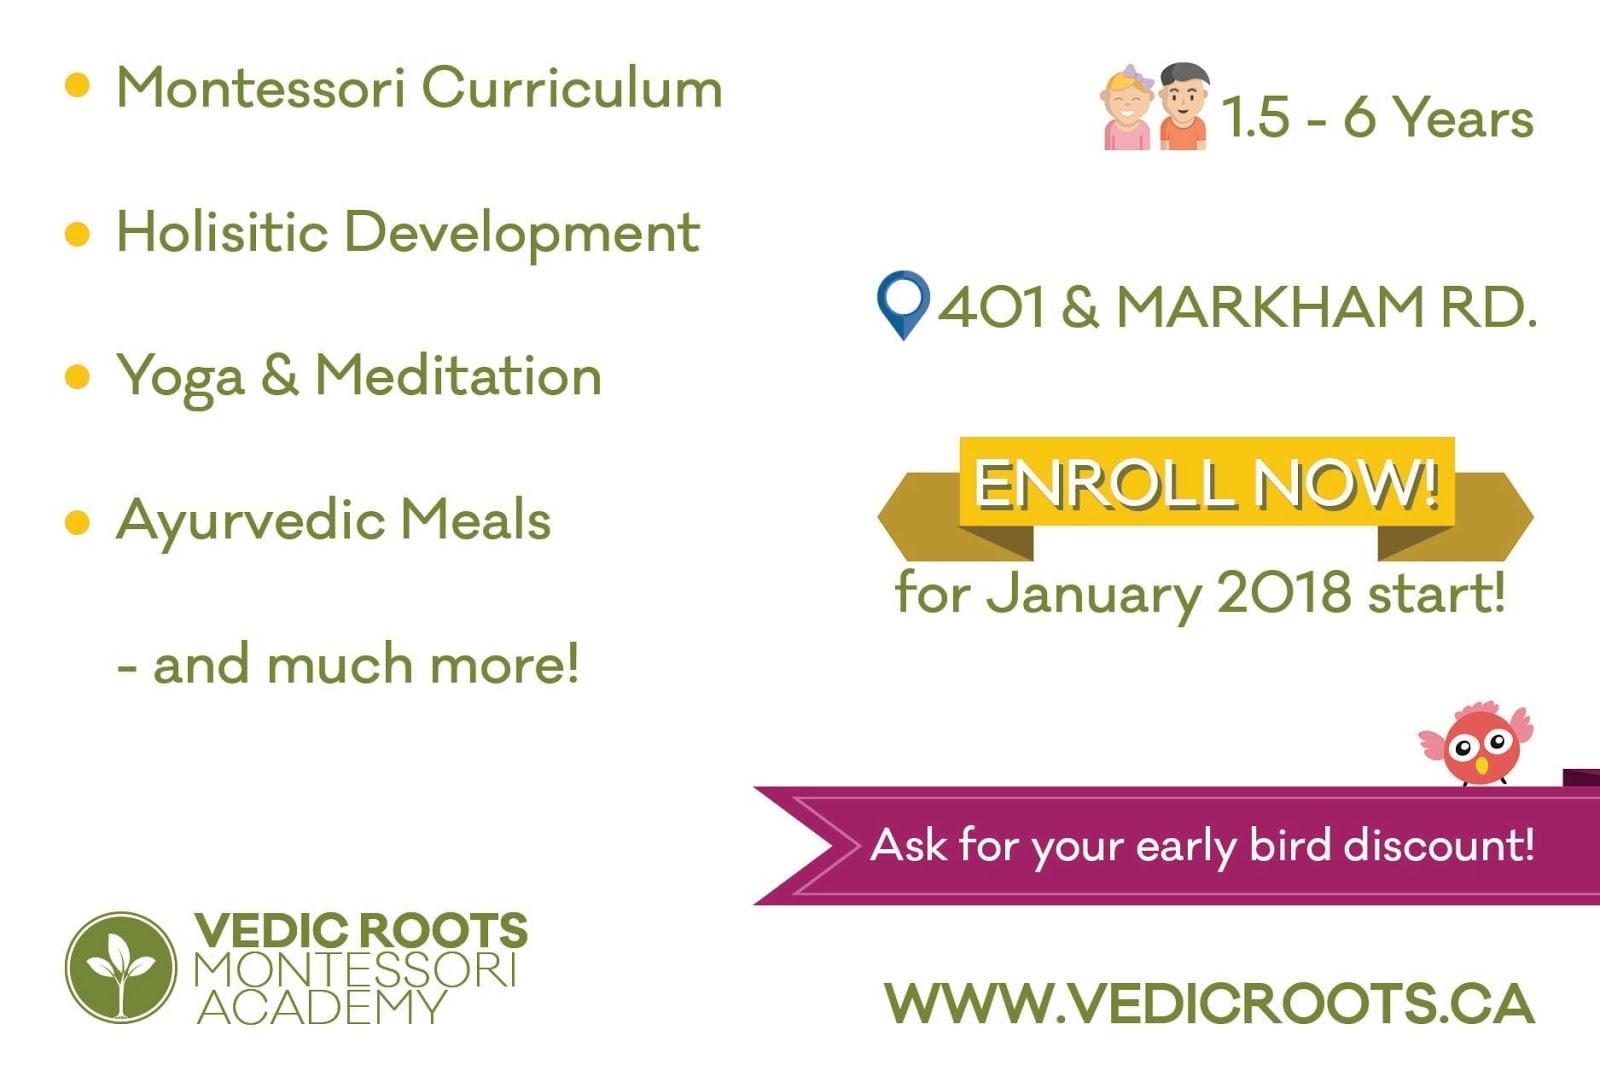 Vedic Roots Montessori Academy